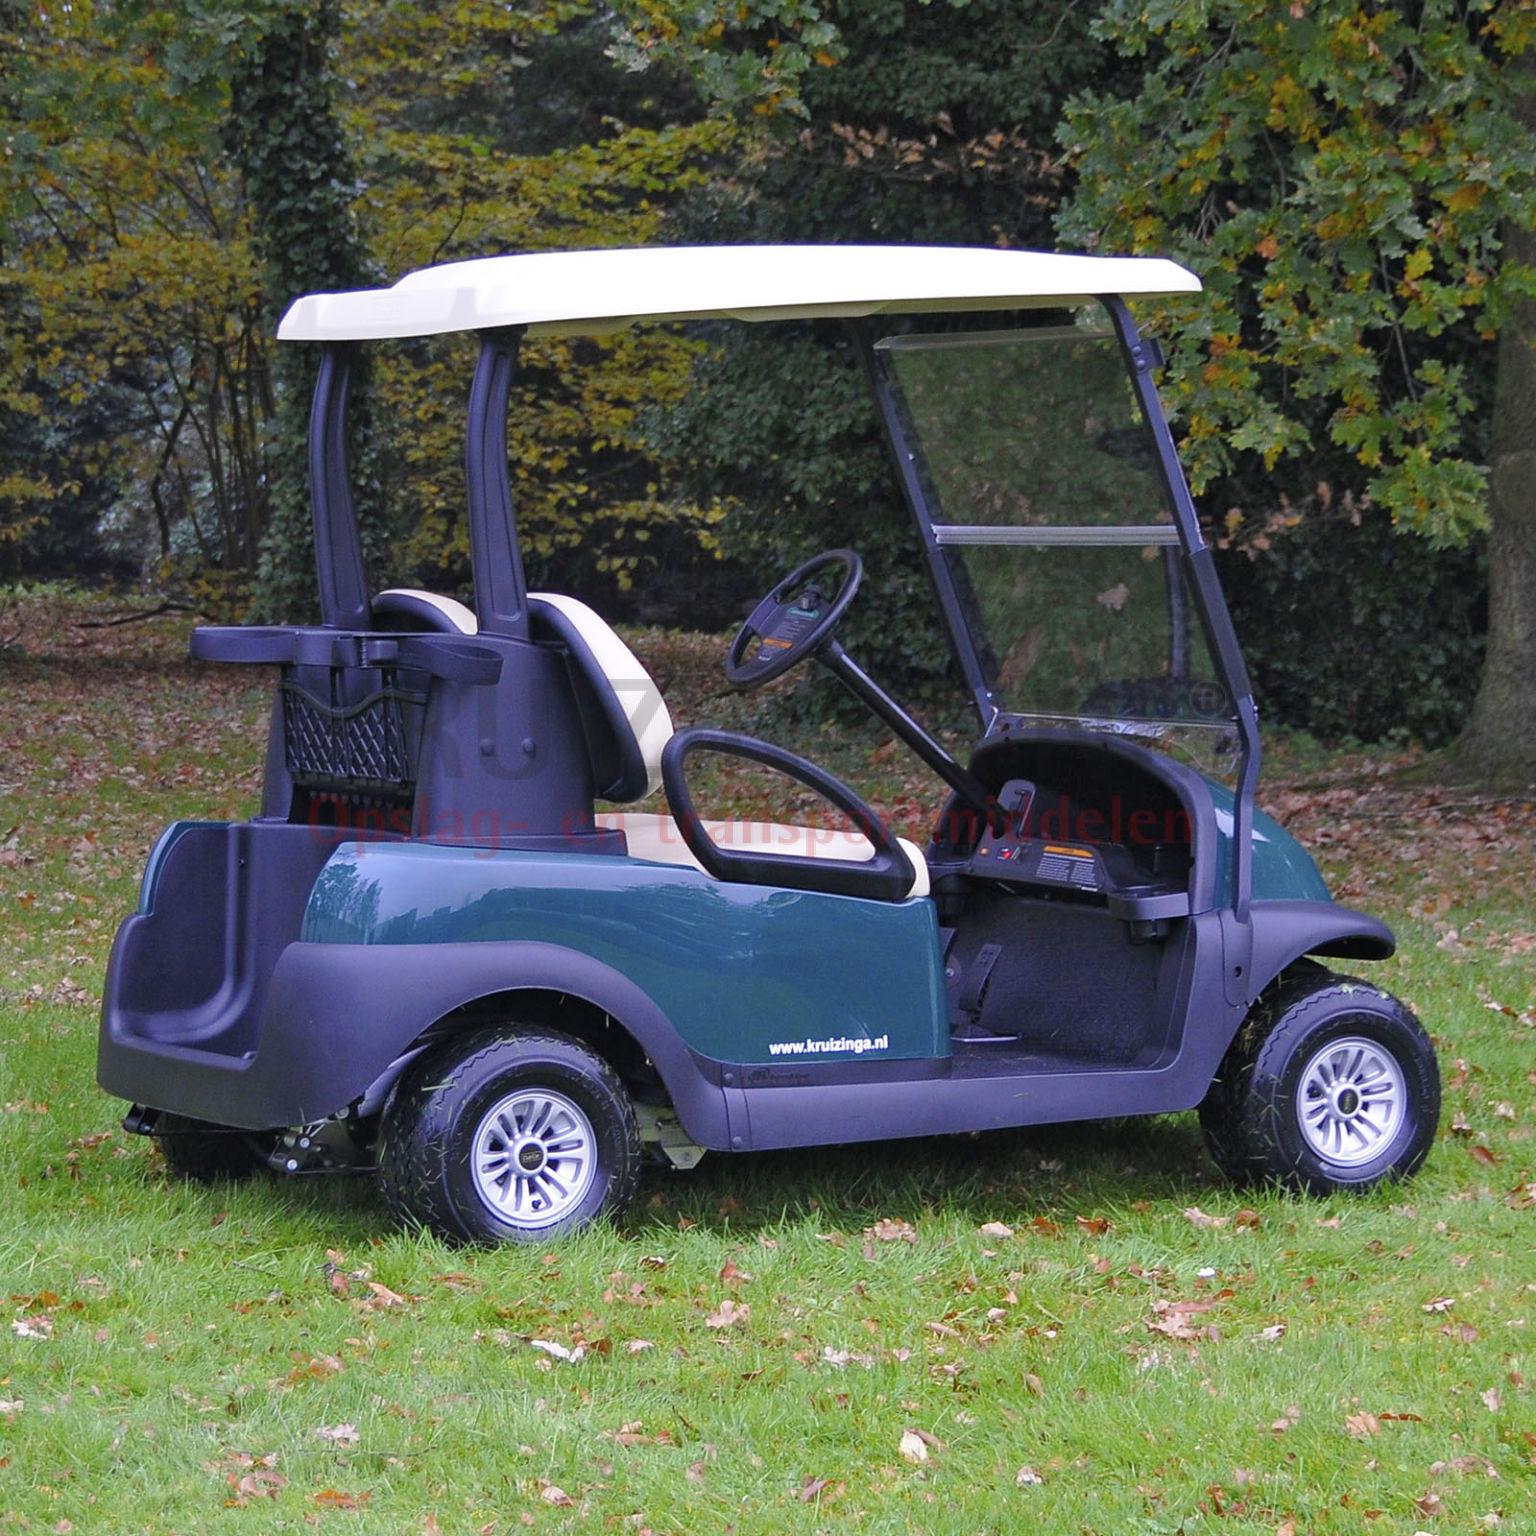 golf cart club car precedent i2 pour 2 personnes lectrique. Black Bedroom Furniture Sets. Home Design Ideas